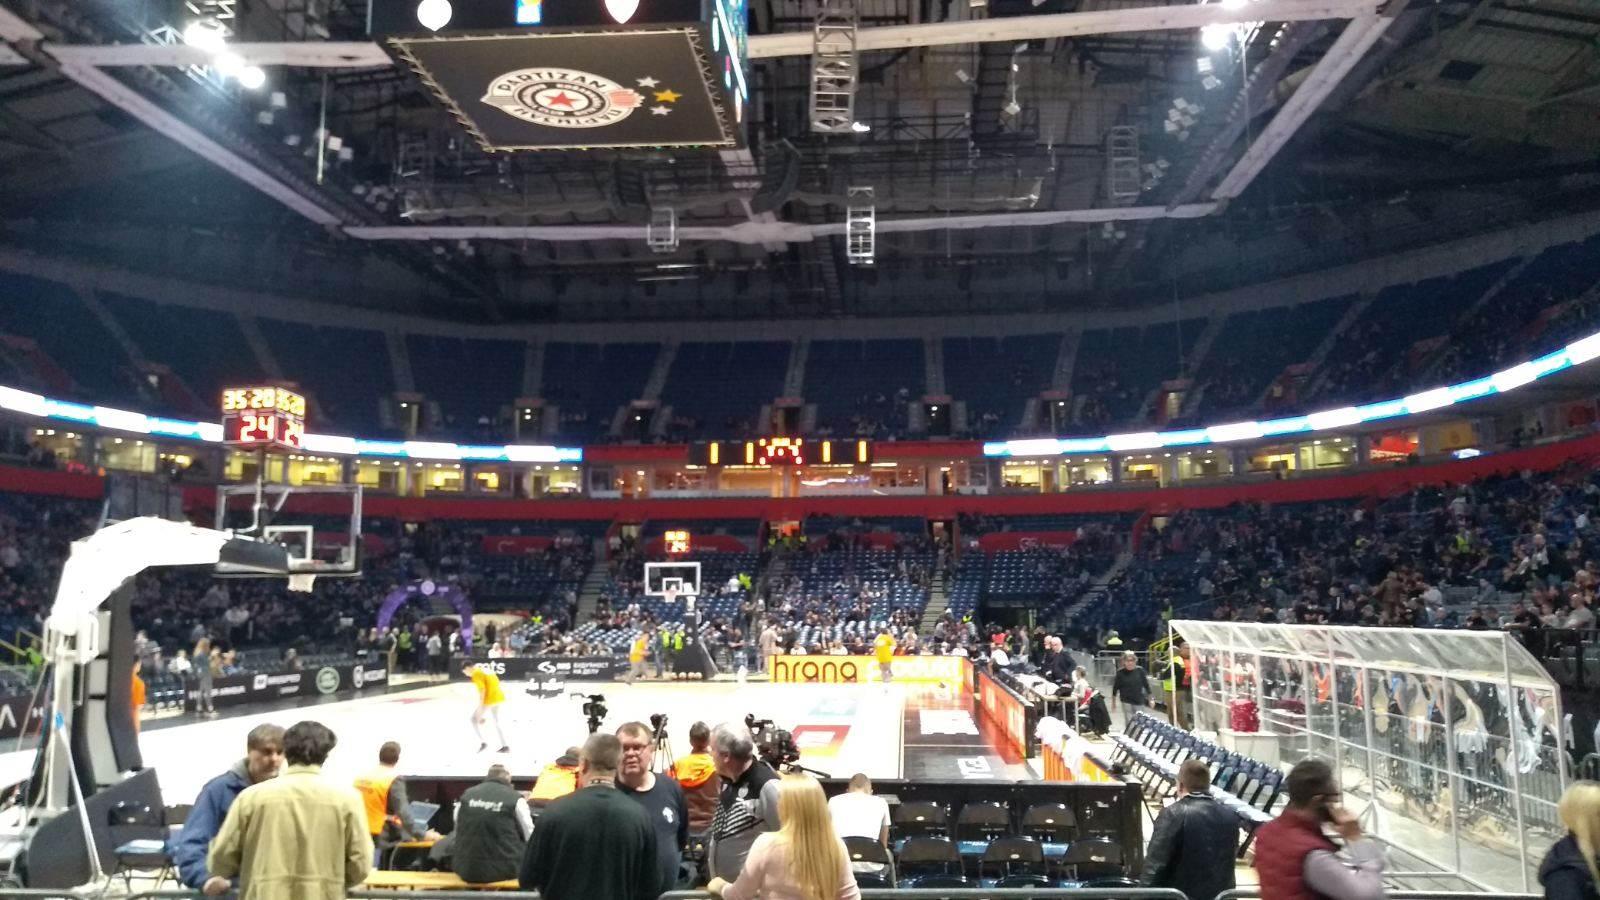 štark arena.jpg